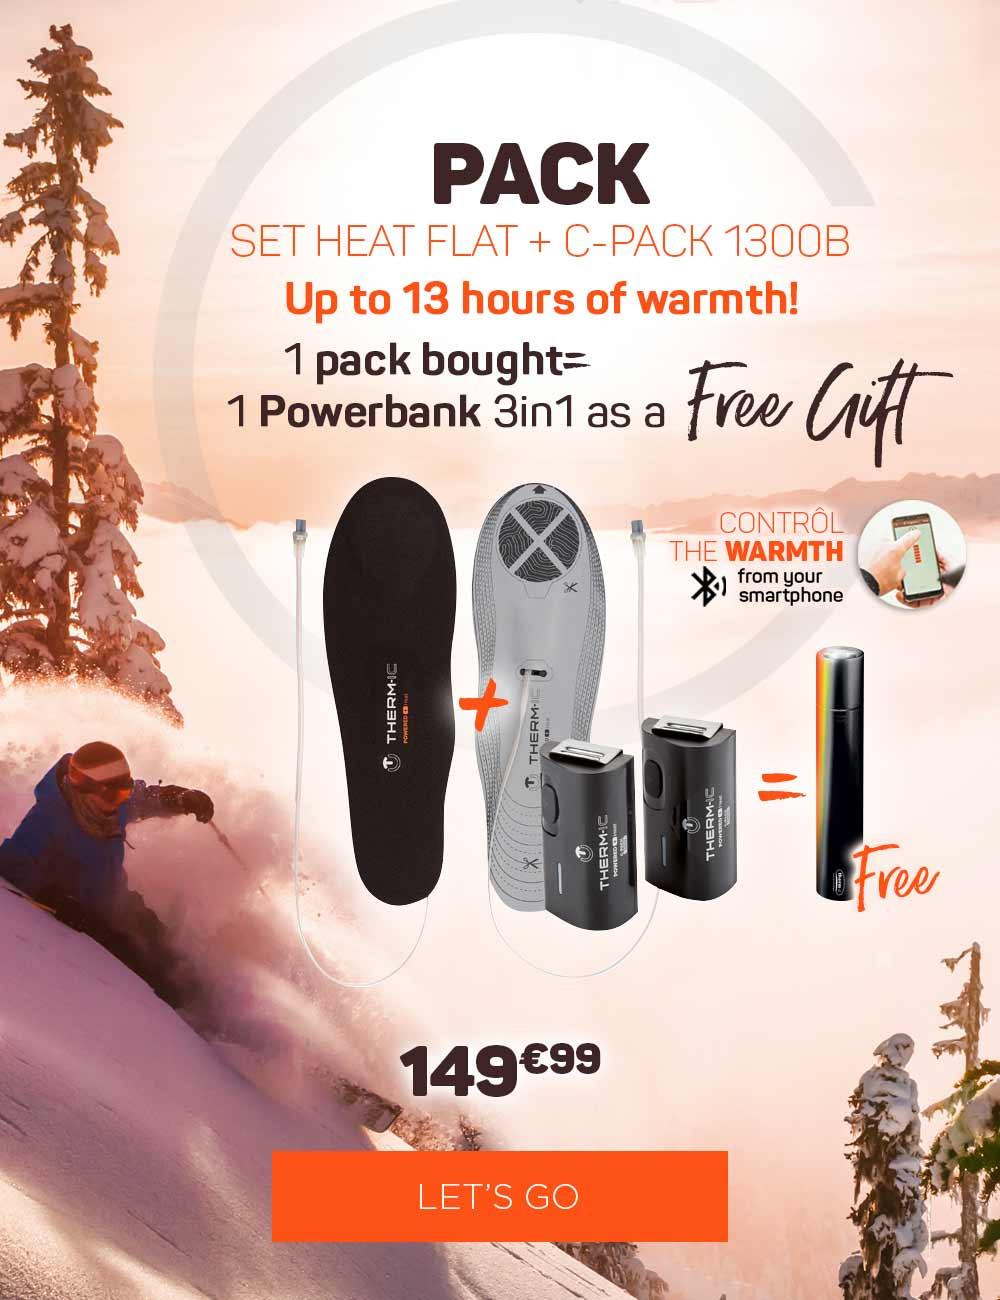 Buy 1 set heat flat + 1300, get your free powerbank 3in1